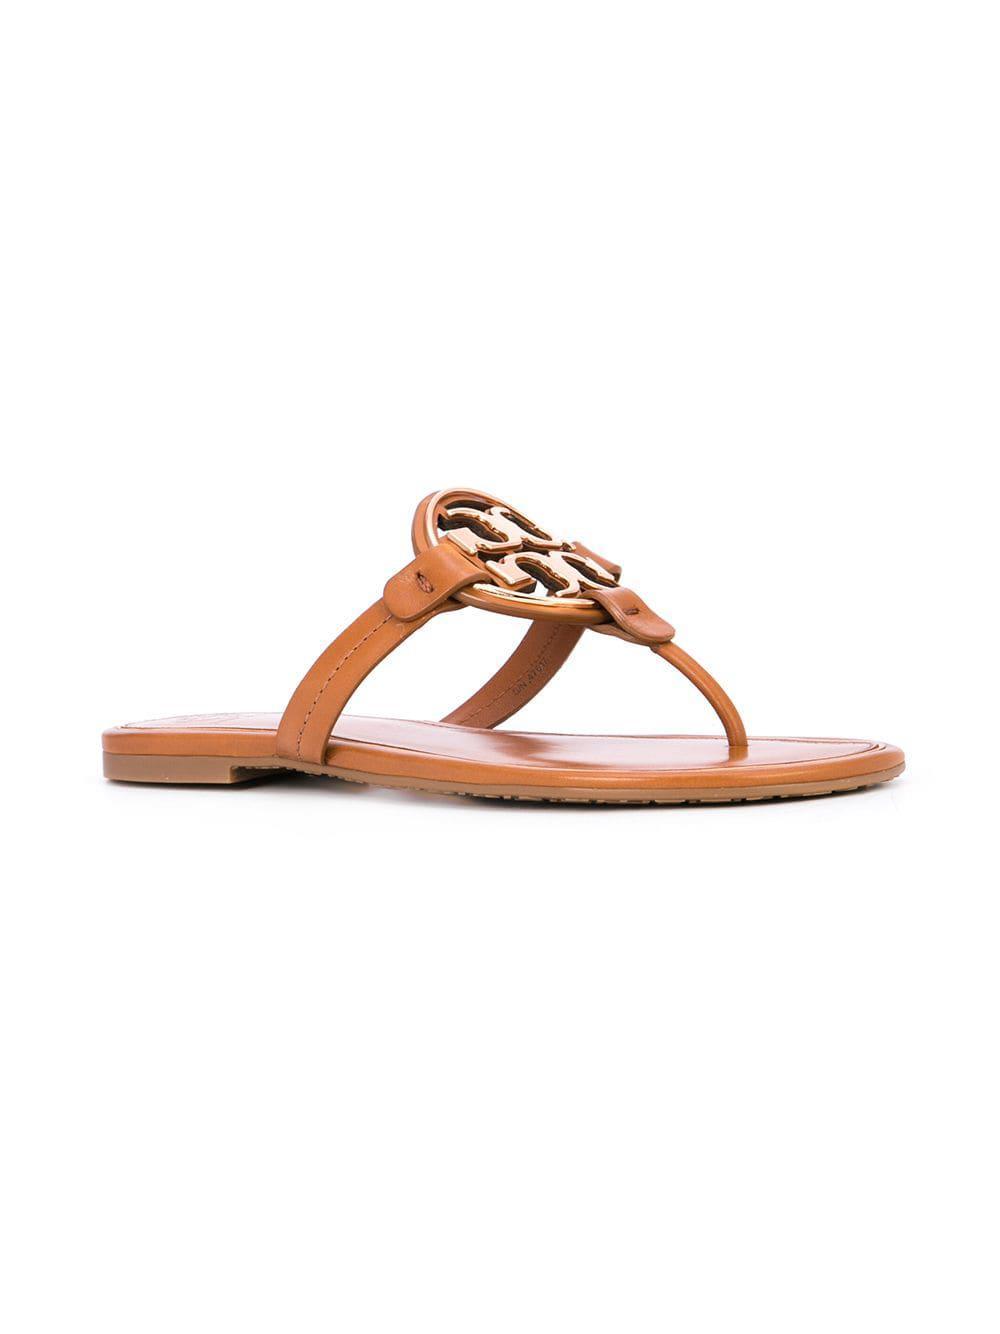 b8c3f22f5 Tory Burch Liana Flat Sandals in Brown - Lyst